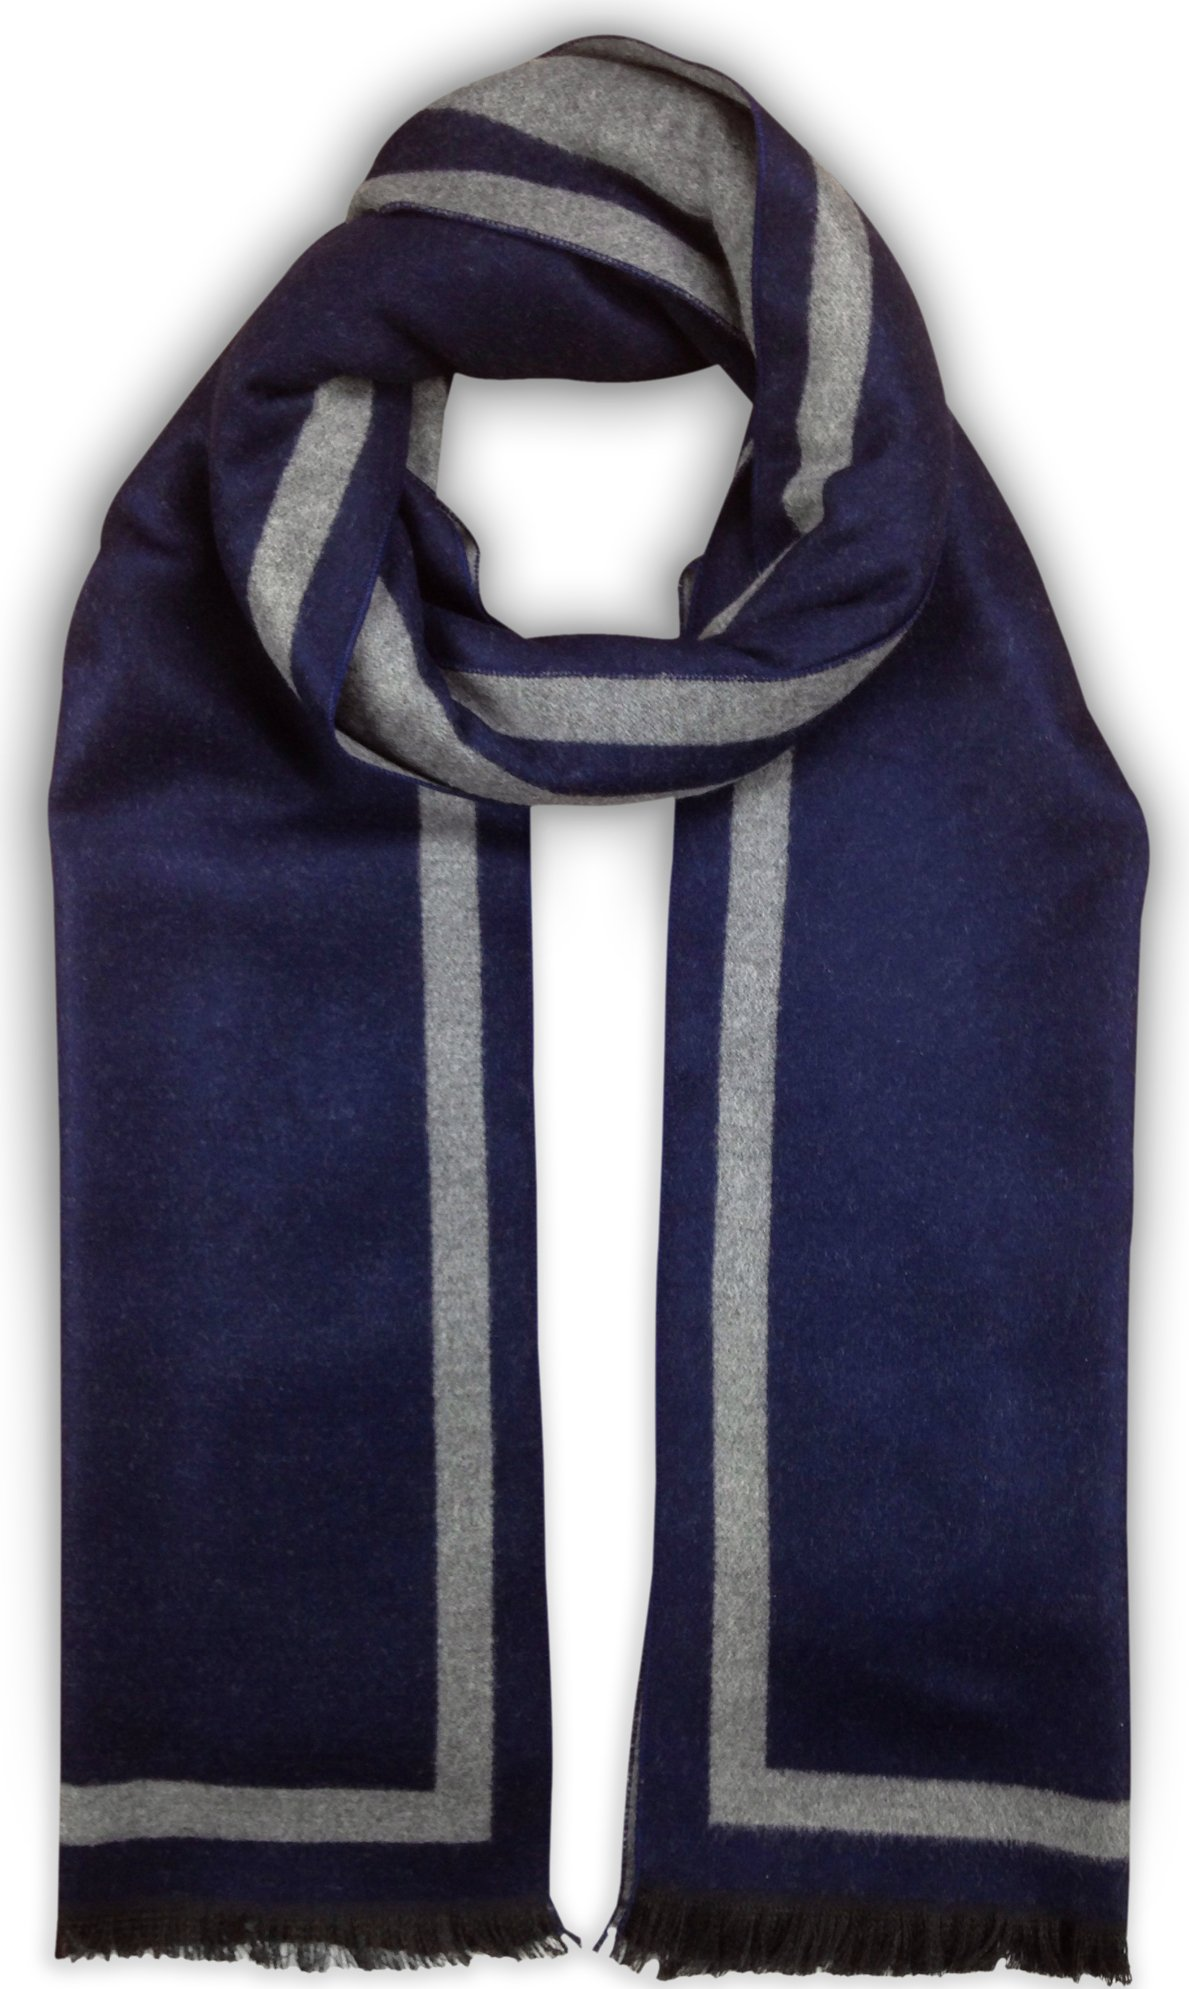 Bleu Nero Luxurious Winter Scarf for Men and Women – Large Selection of Unique Design Scarves – Super Soft Premium Cashmere Feel (Navy + Light Grey Border)